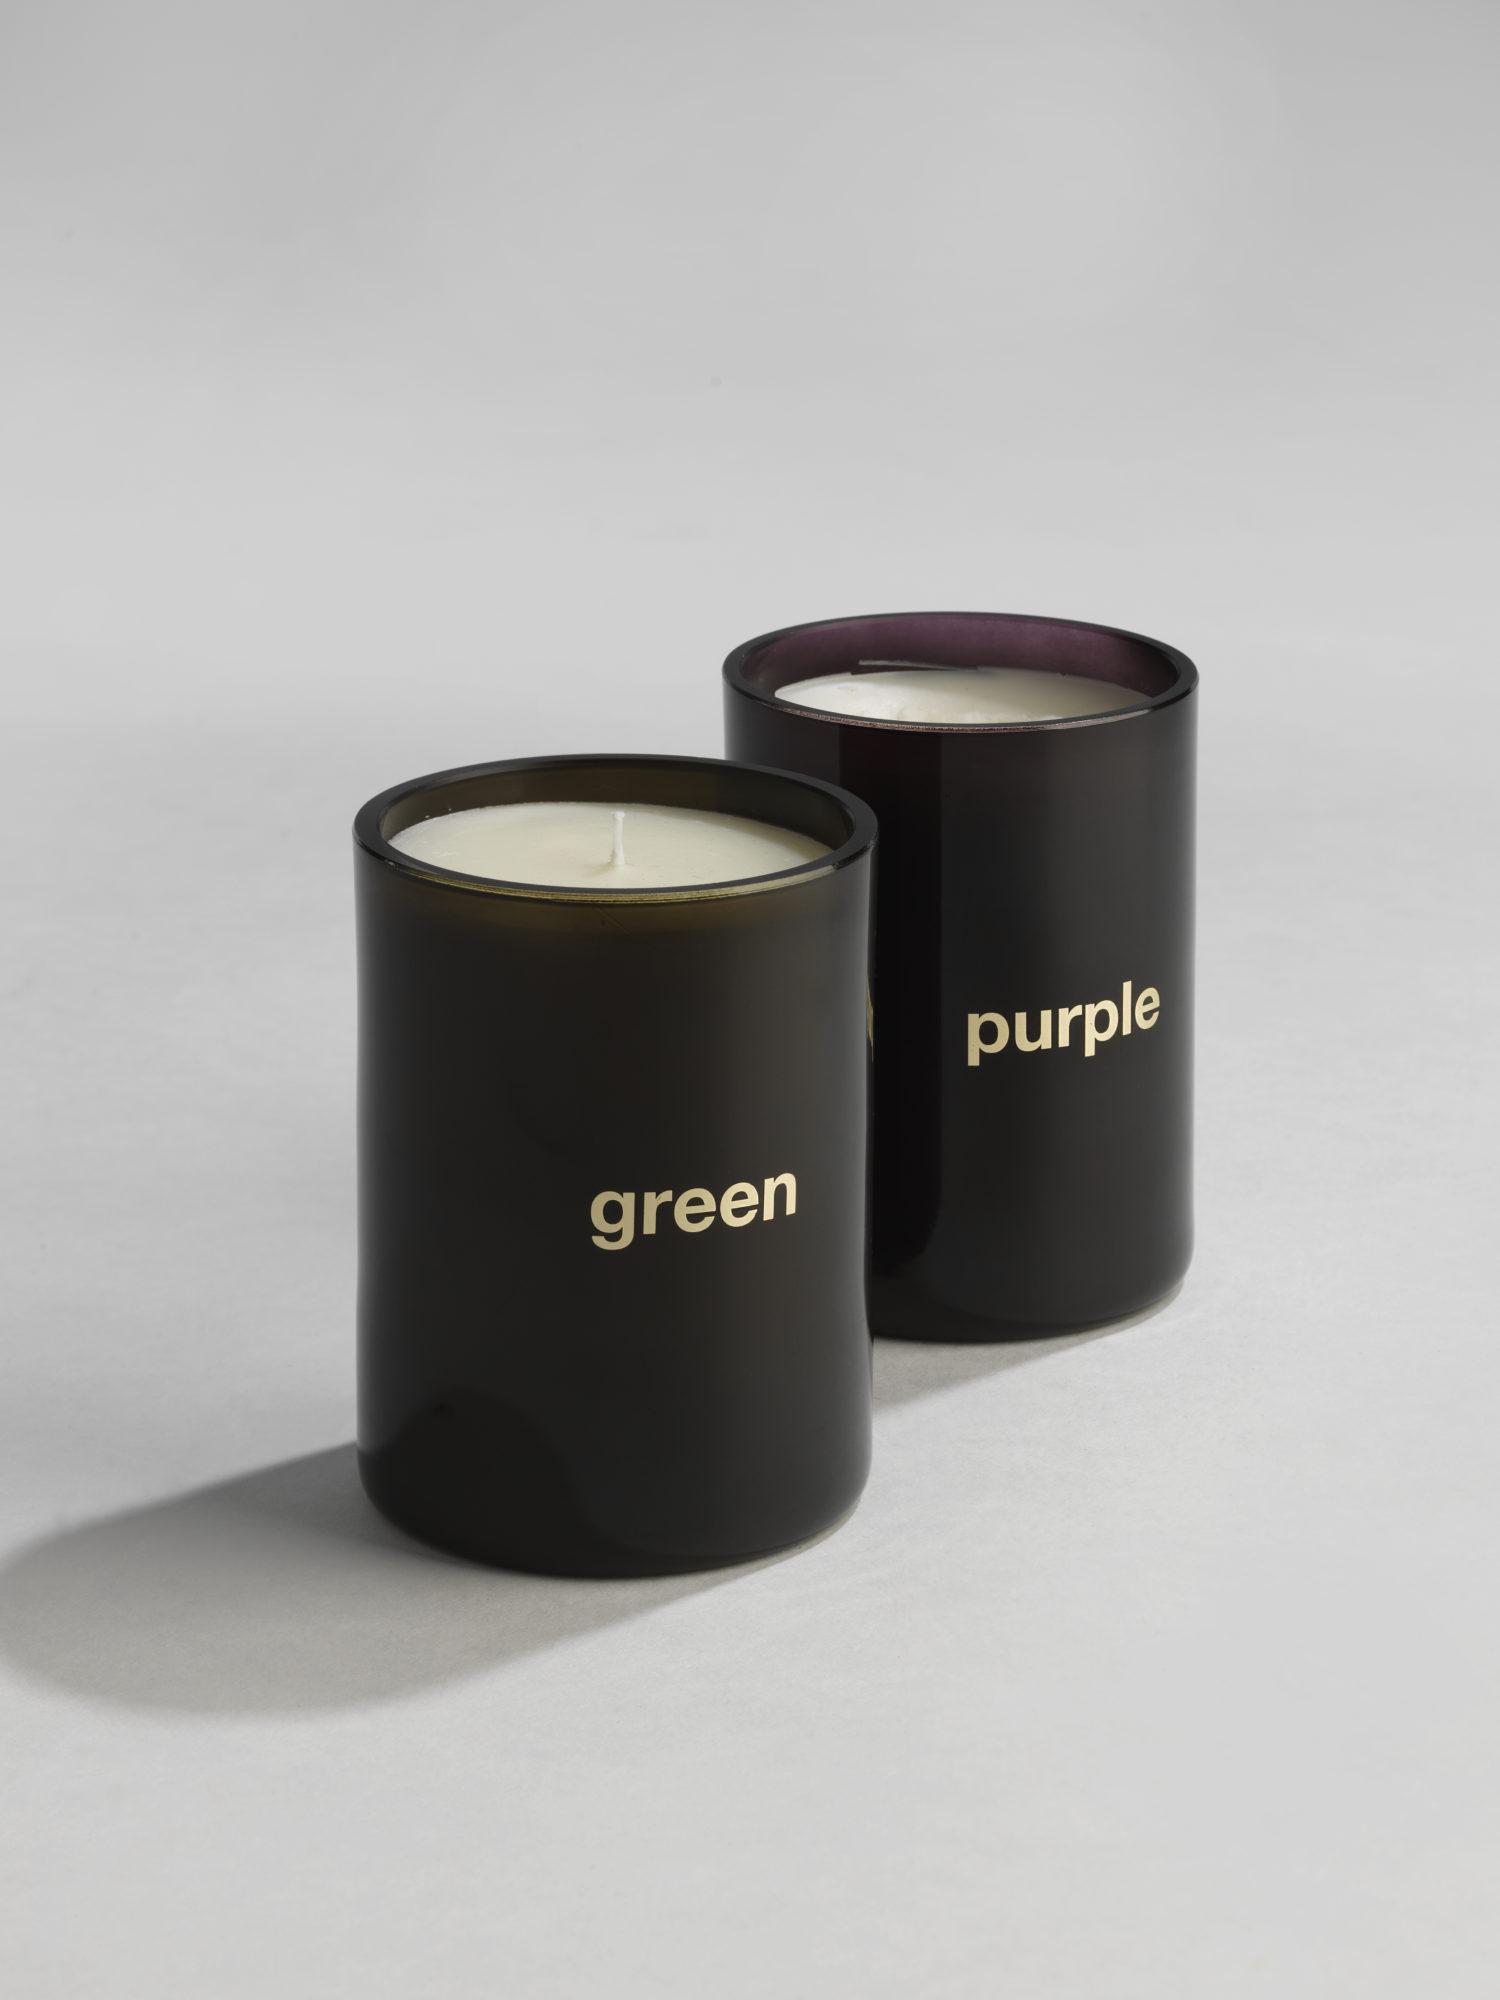 Green & Purple - India Mahdavi